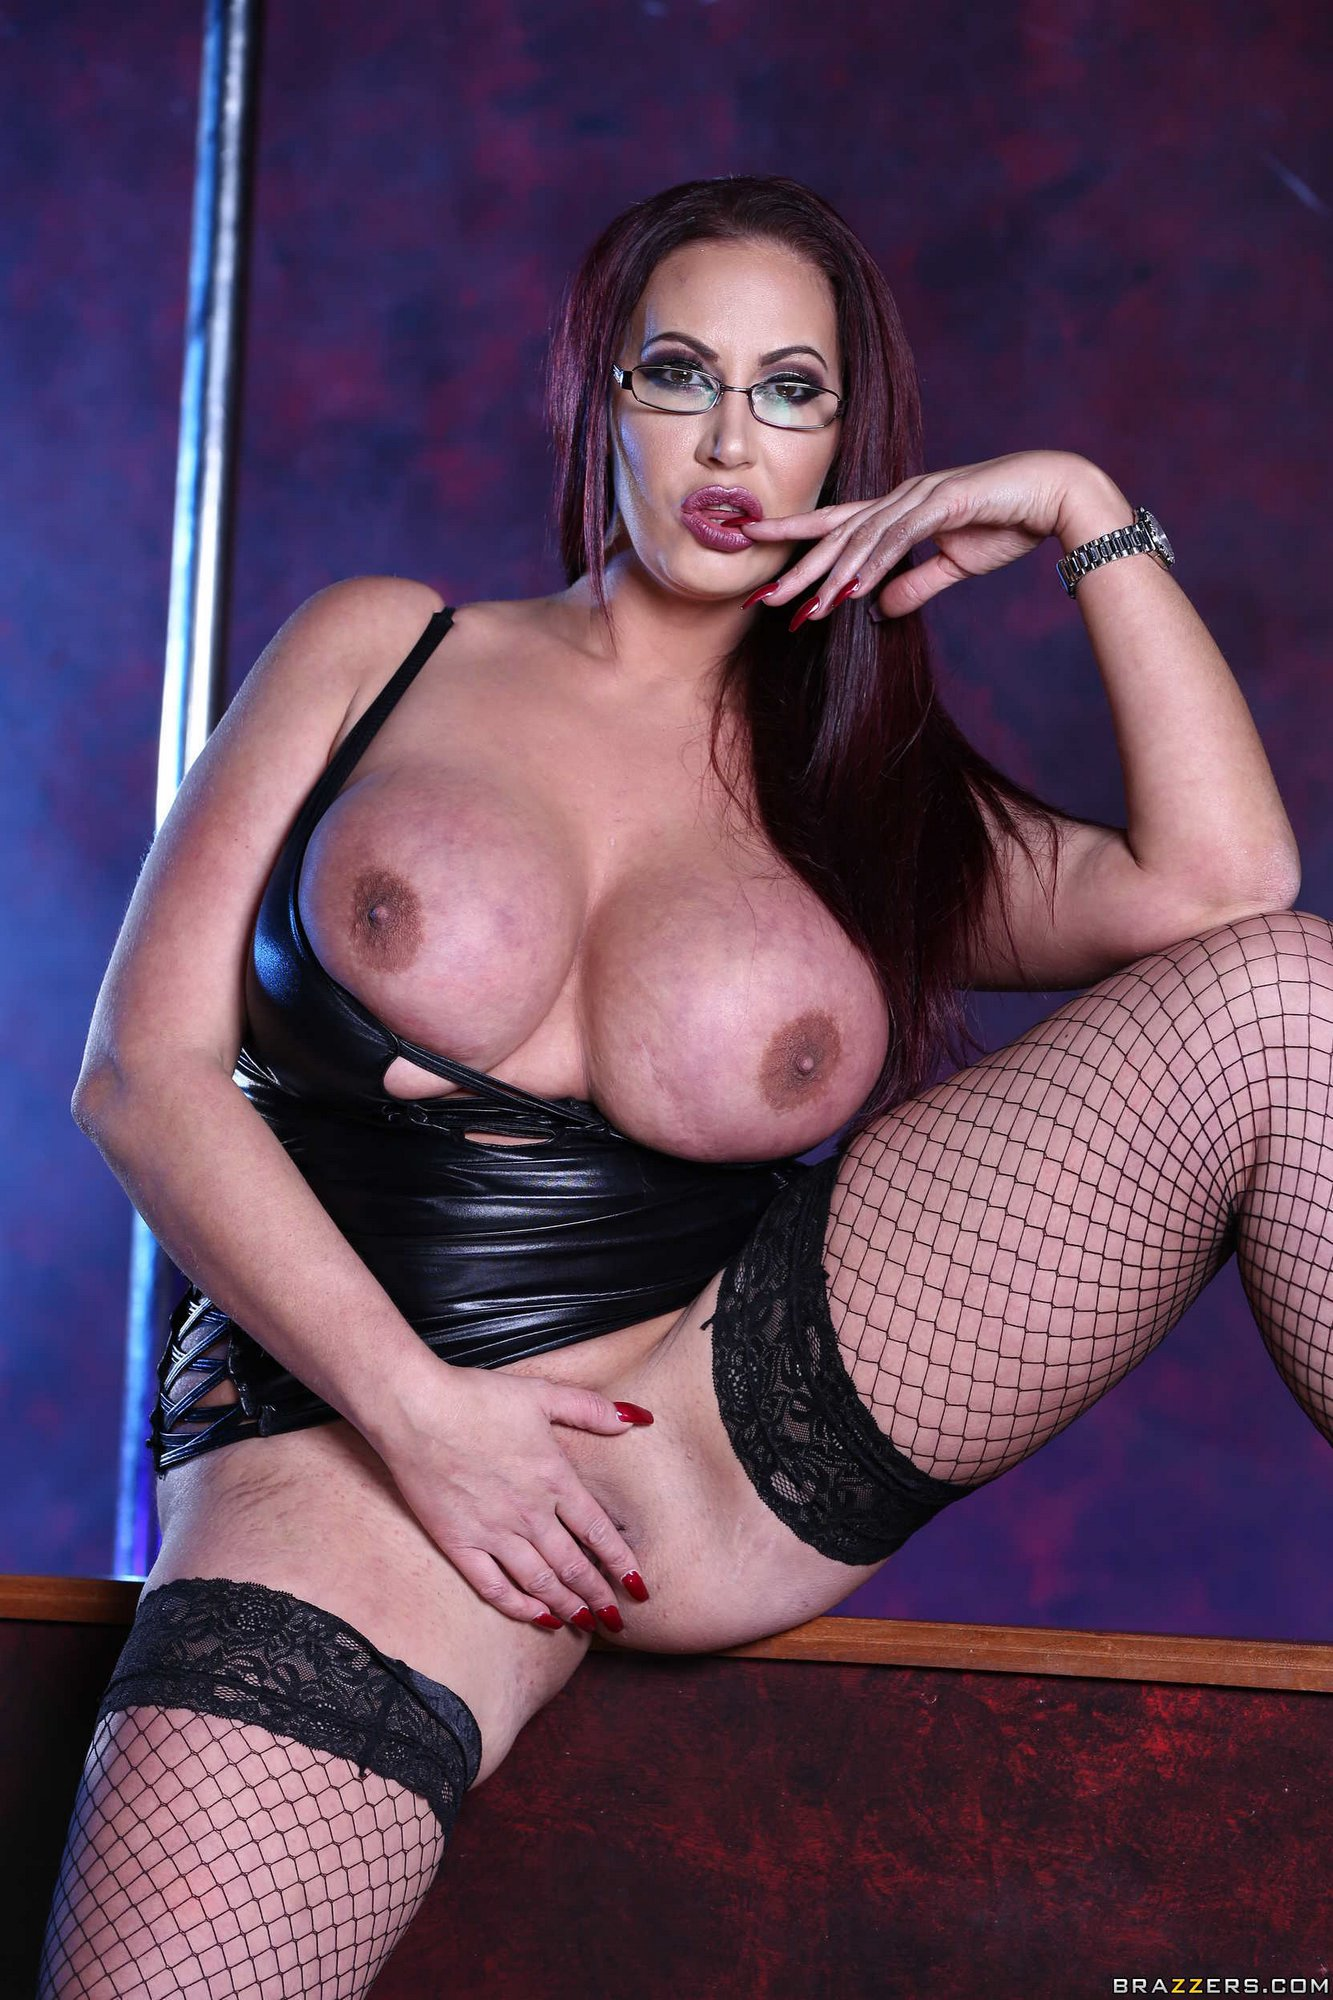 Futa mistress snapchat double penetration